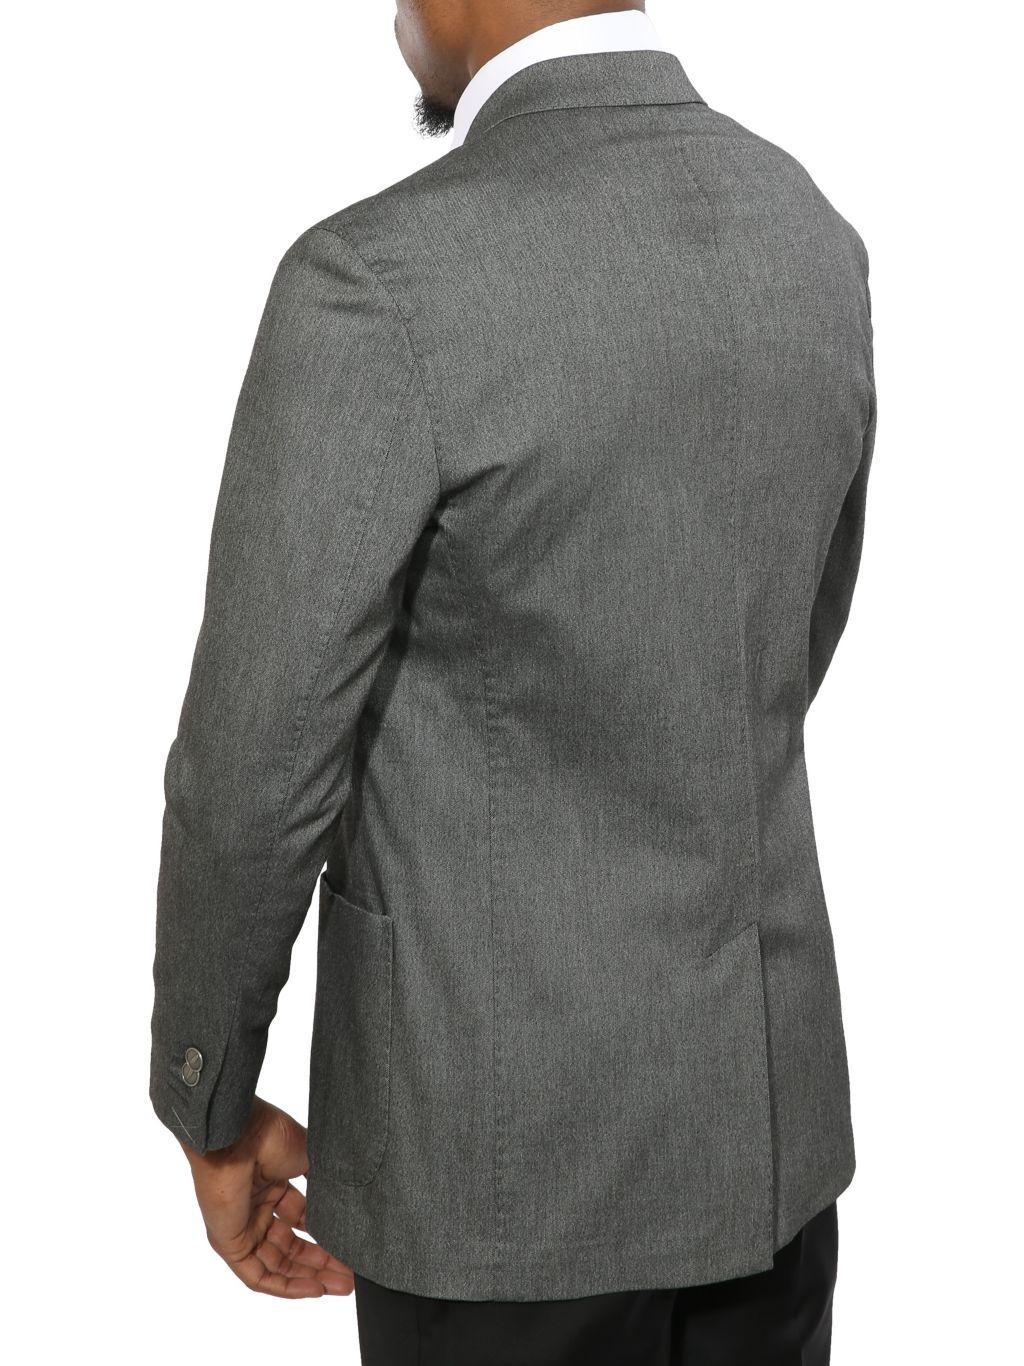 Michael Bastian Slim-Fit Notch Lapel Wool Jacket